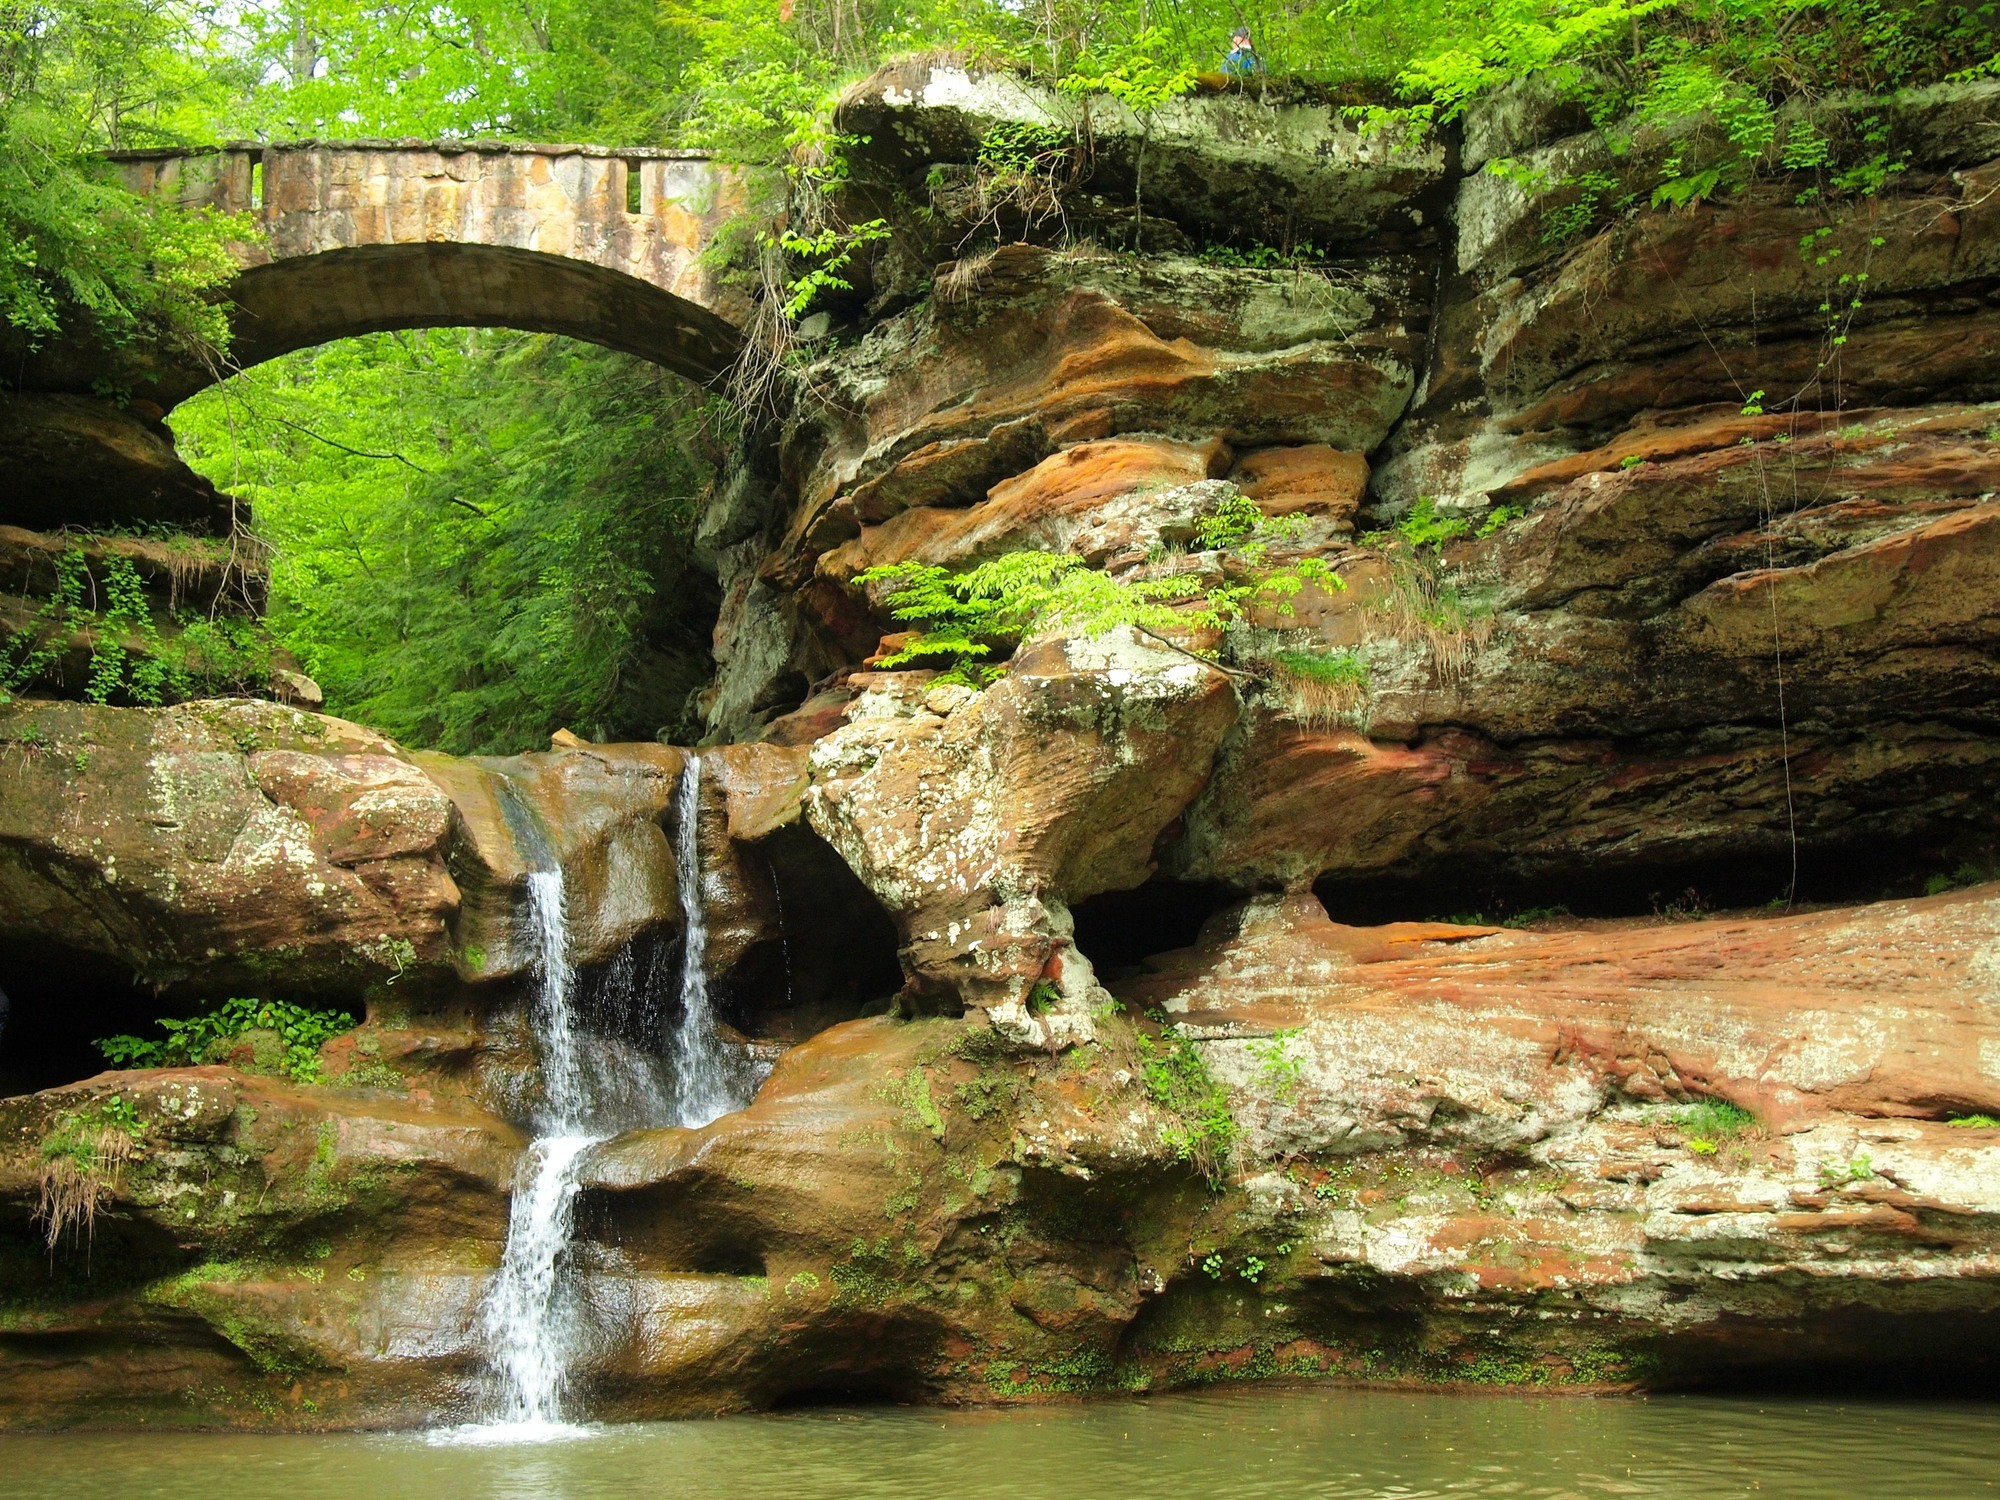 Upper Falls at Hocking Hills State Park